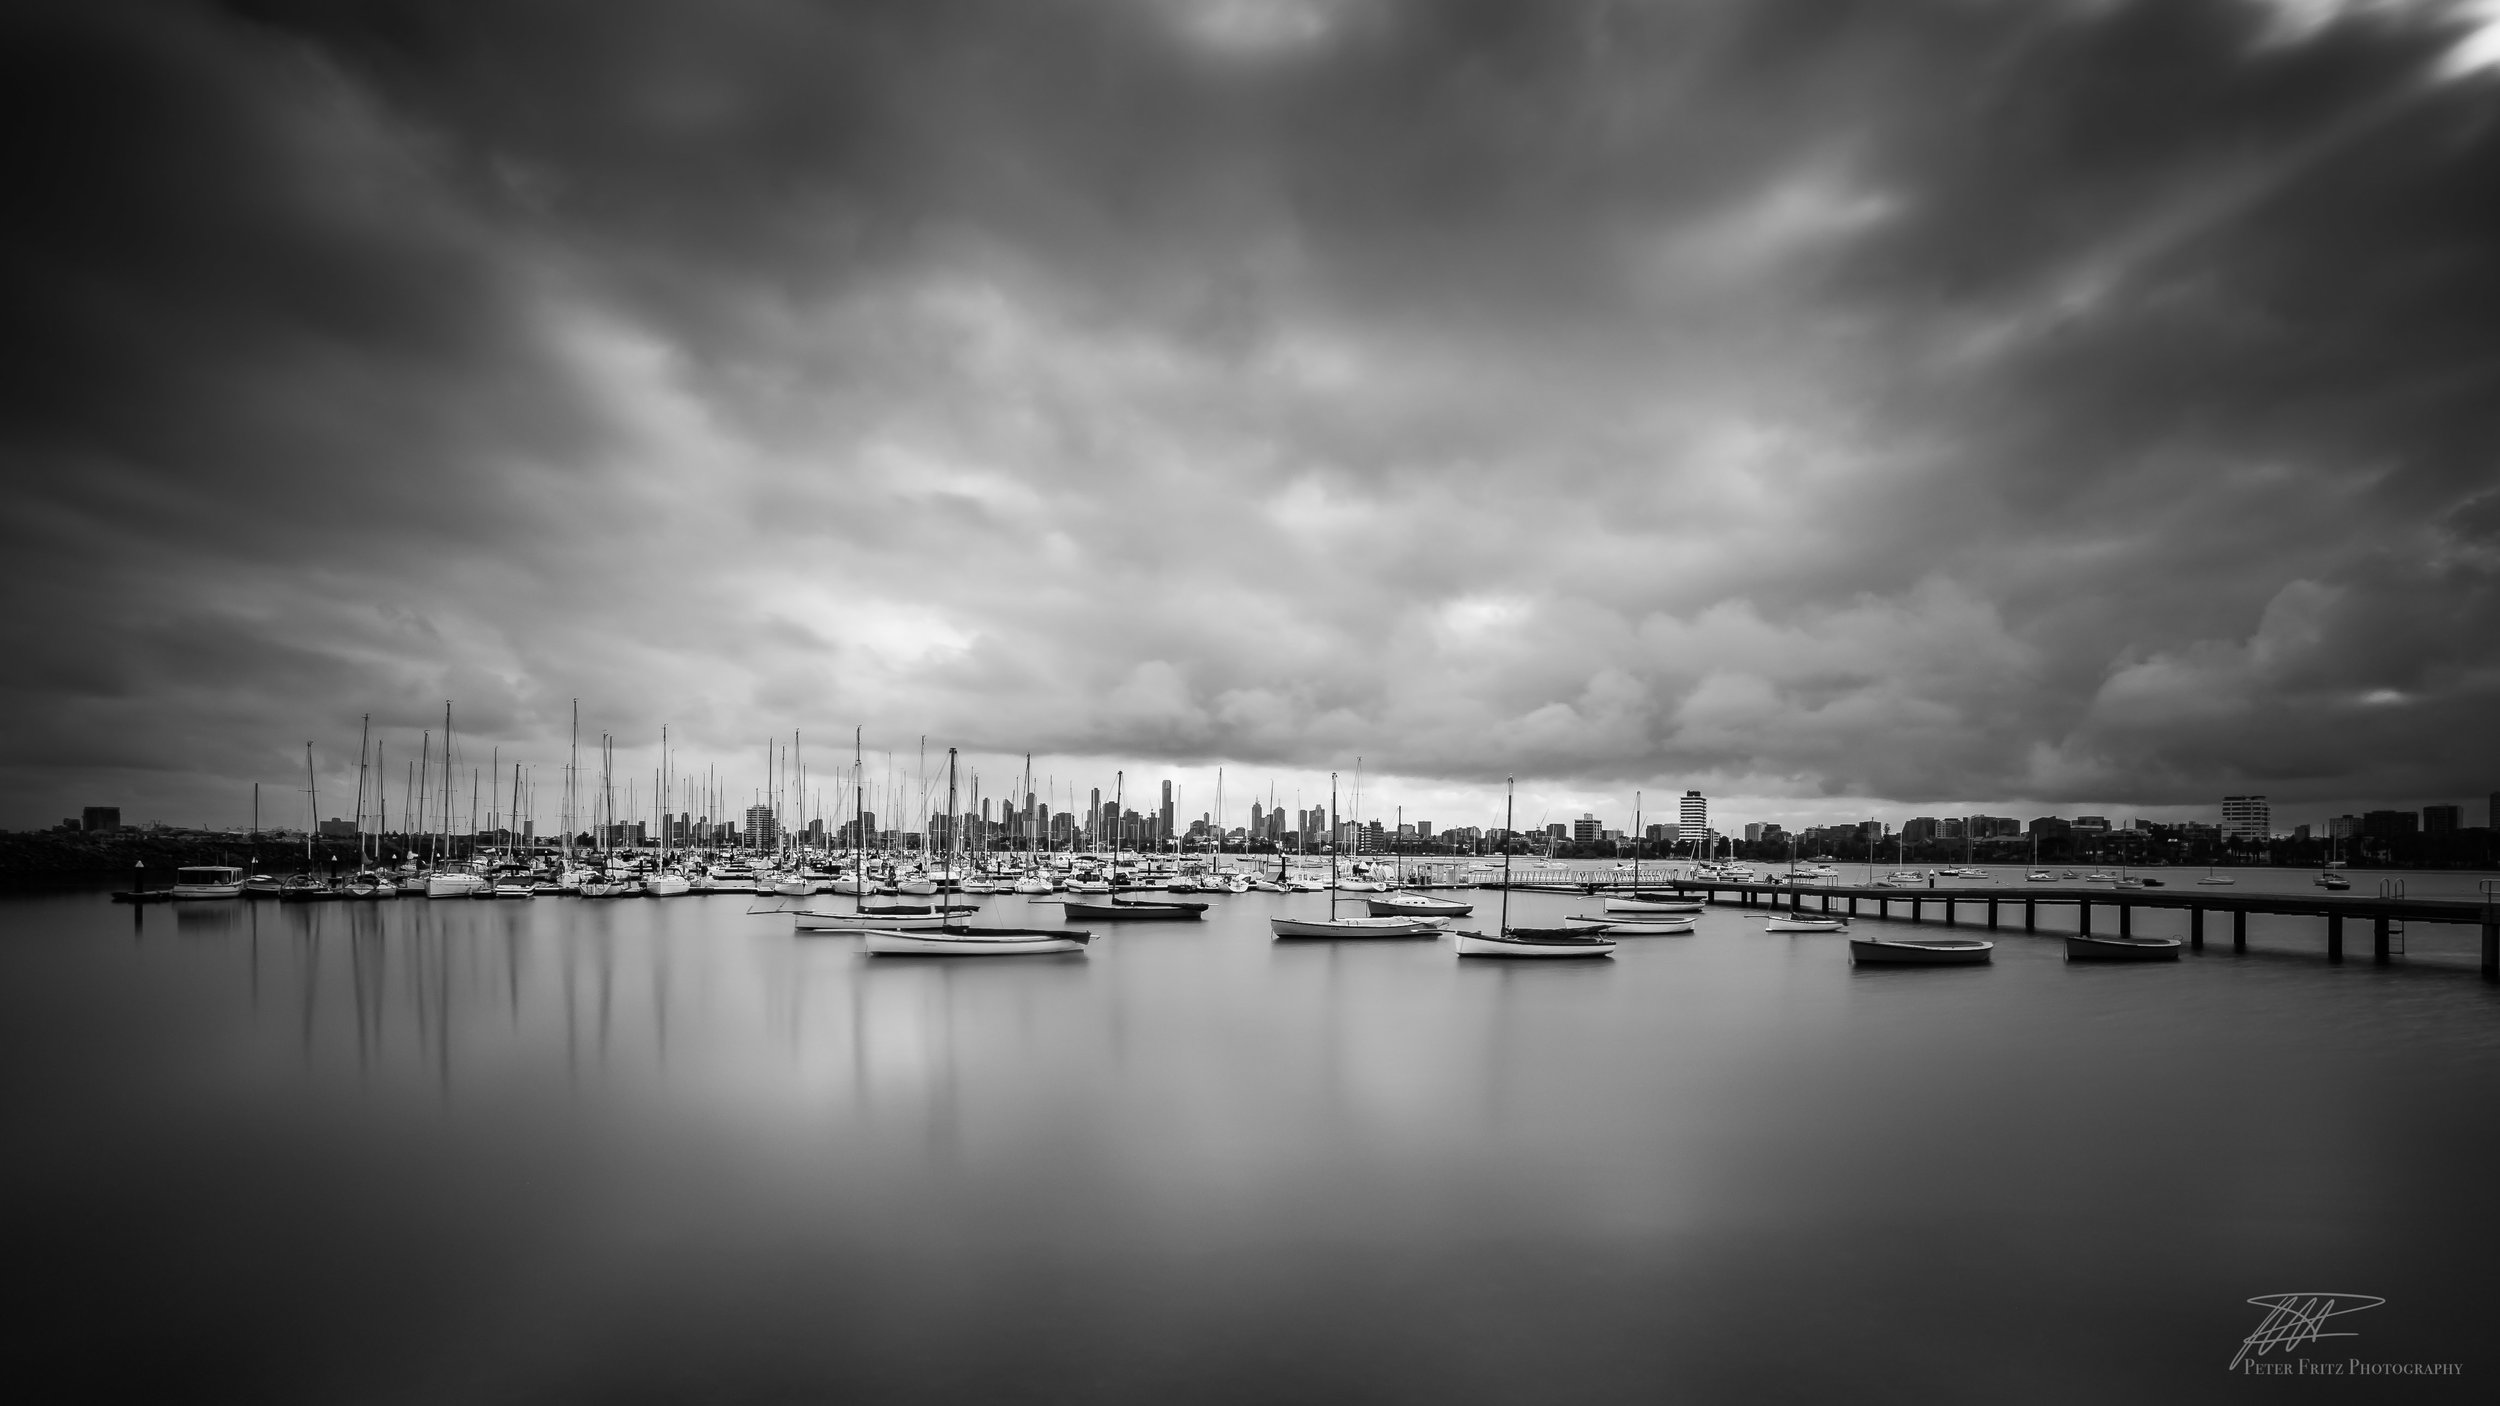 St Kilda Marina 16x9 web.jpg